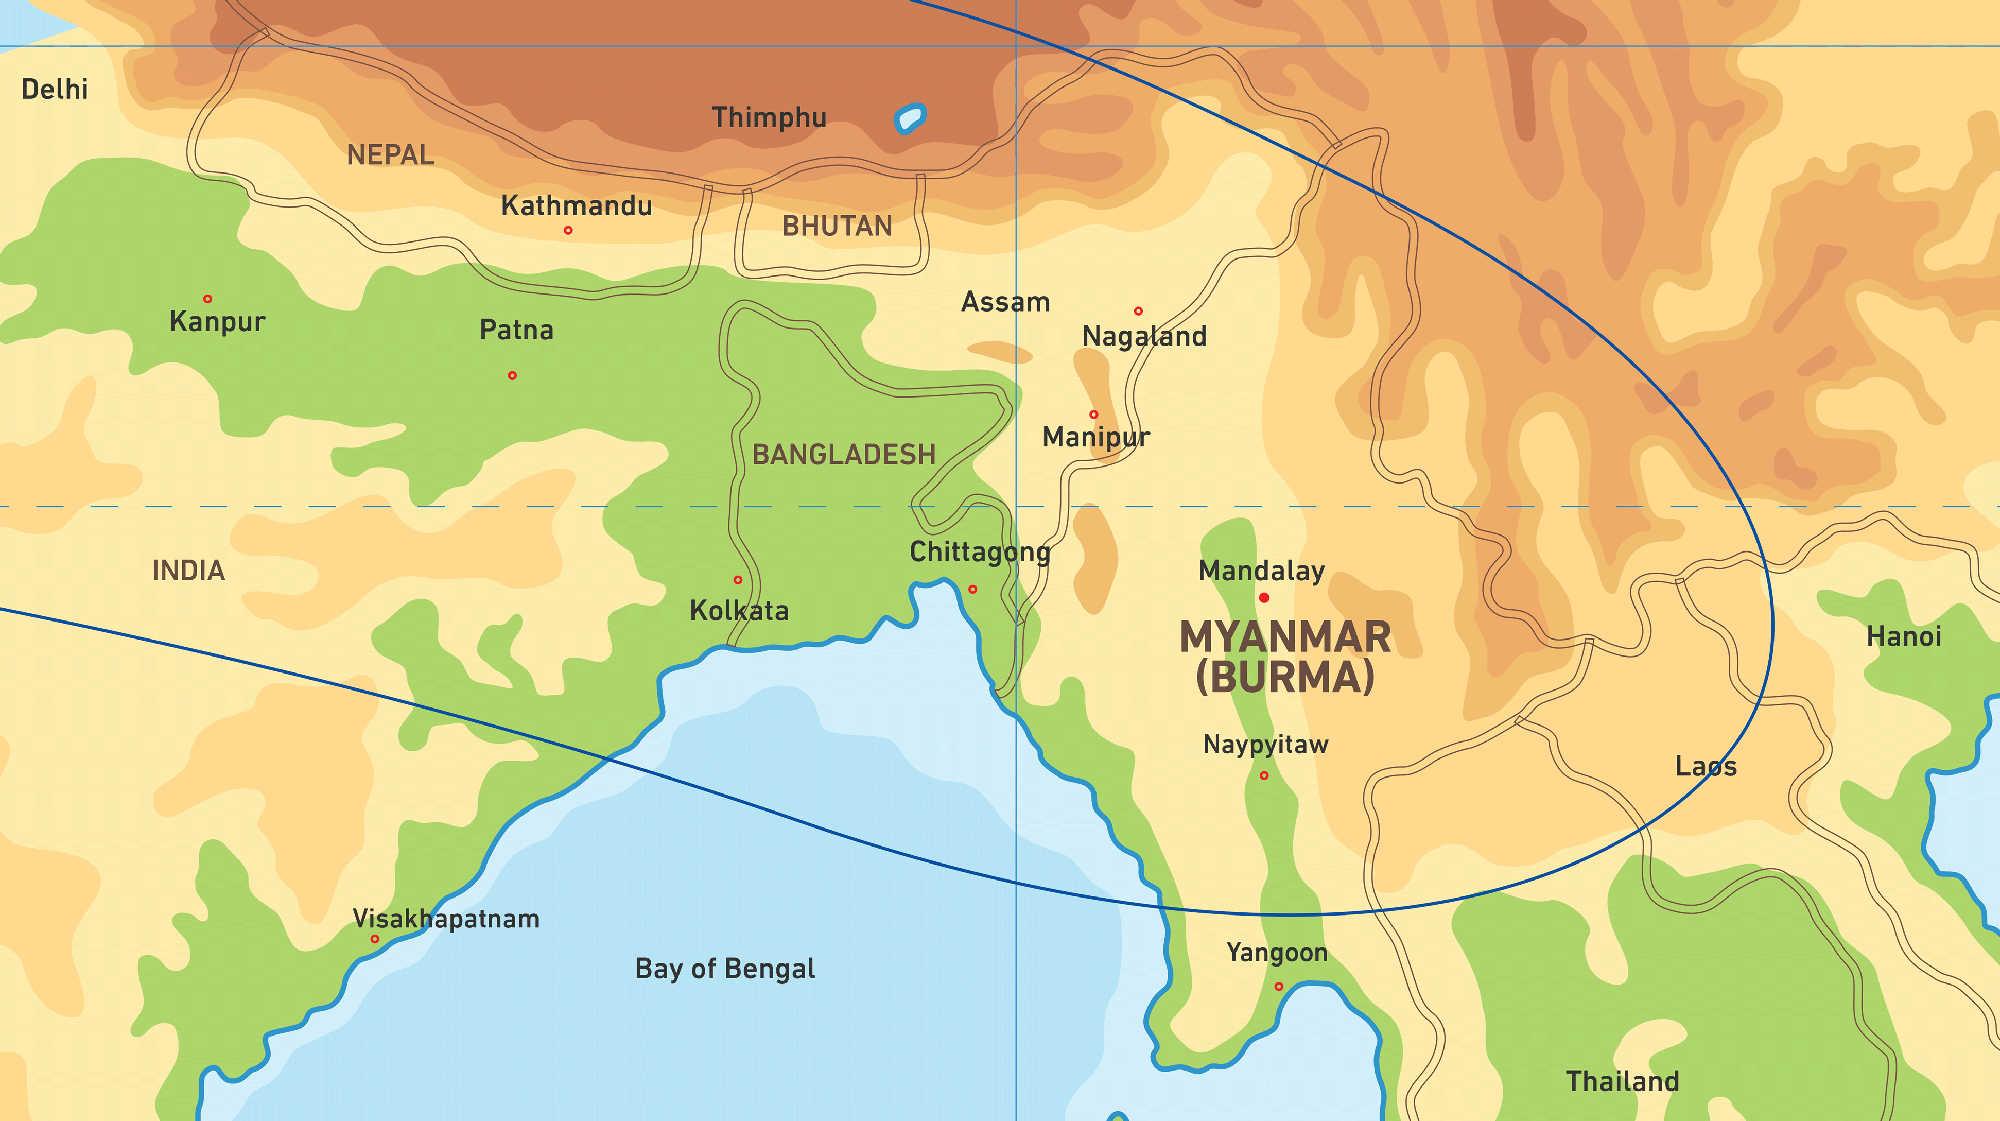 Map of Kacific 1 satellite coverage of Myanmar (Burma)